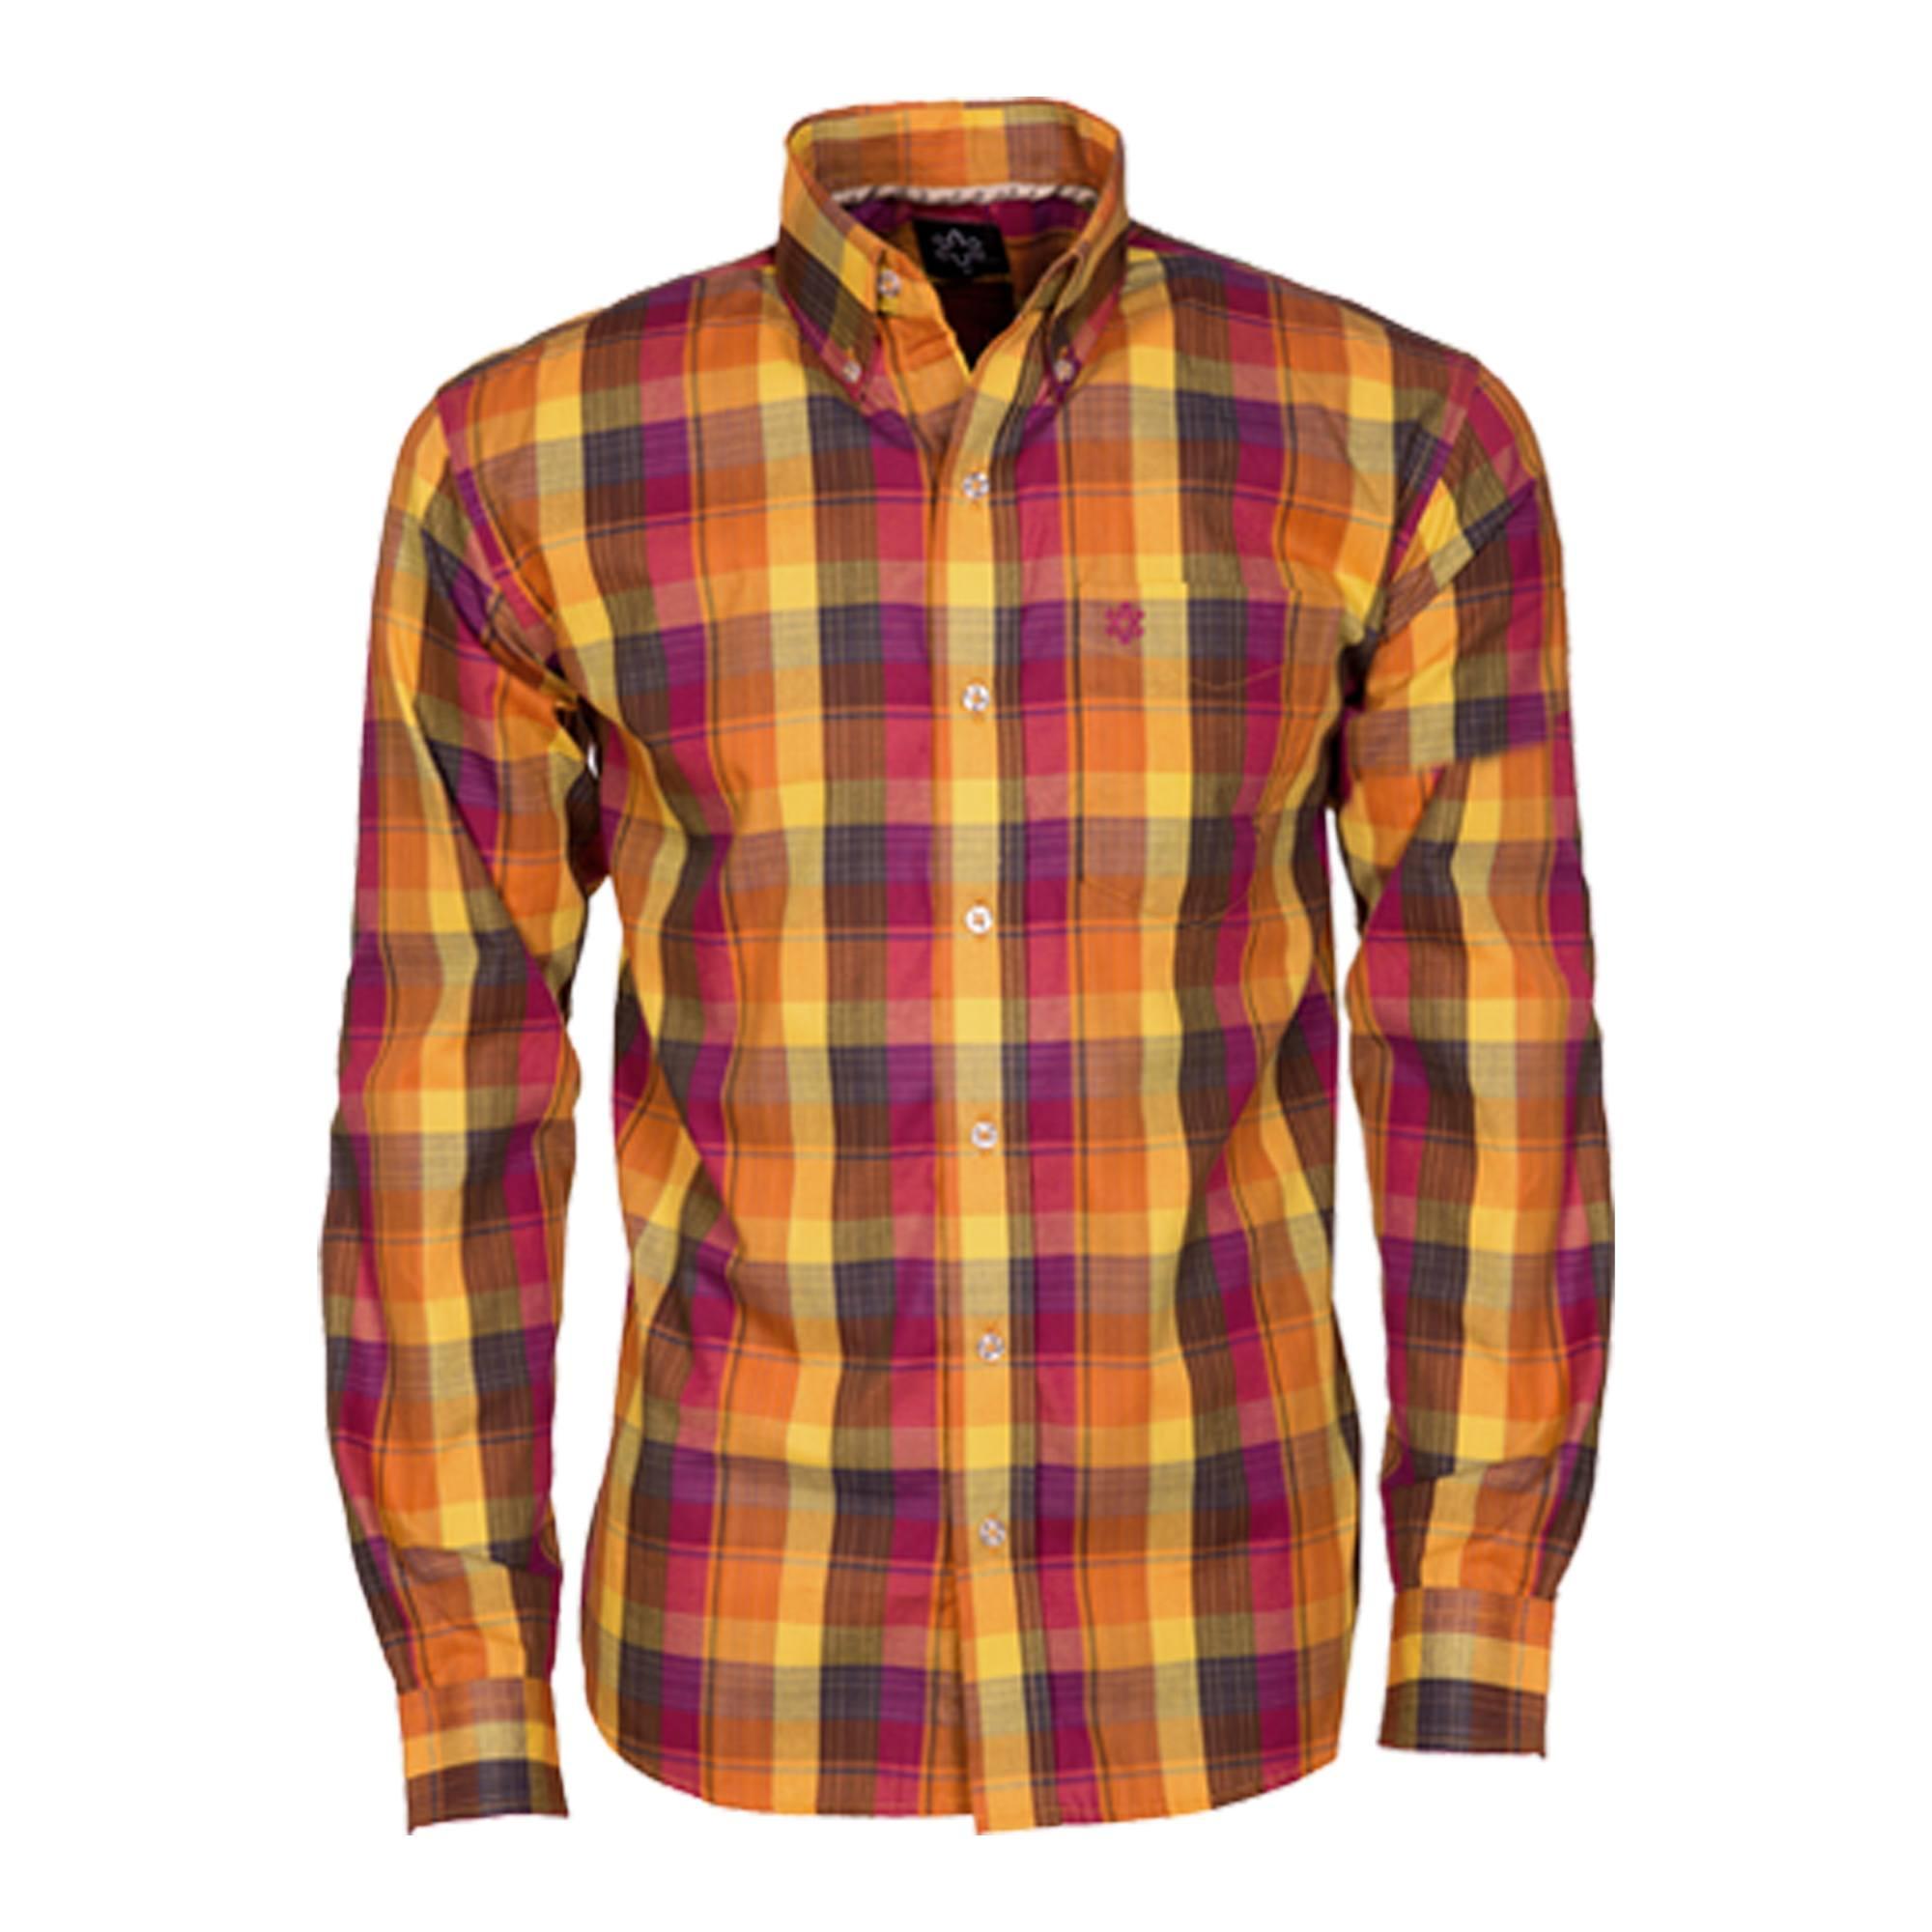 Camisa Masculina Manga Longa Xadrez Laranja e Amarelo